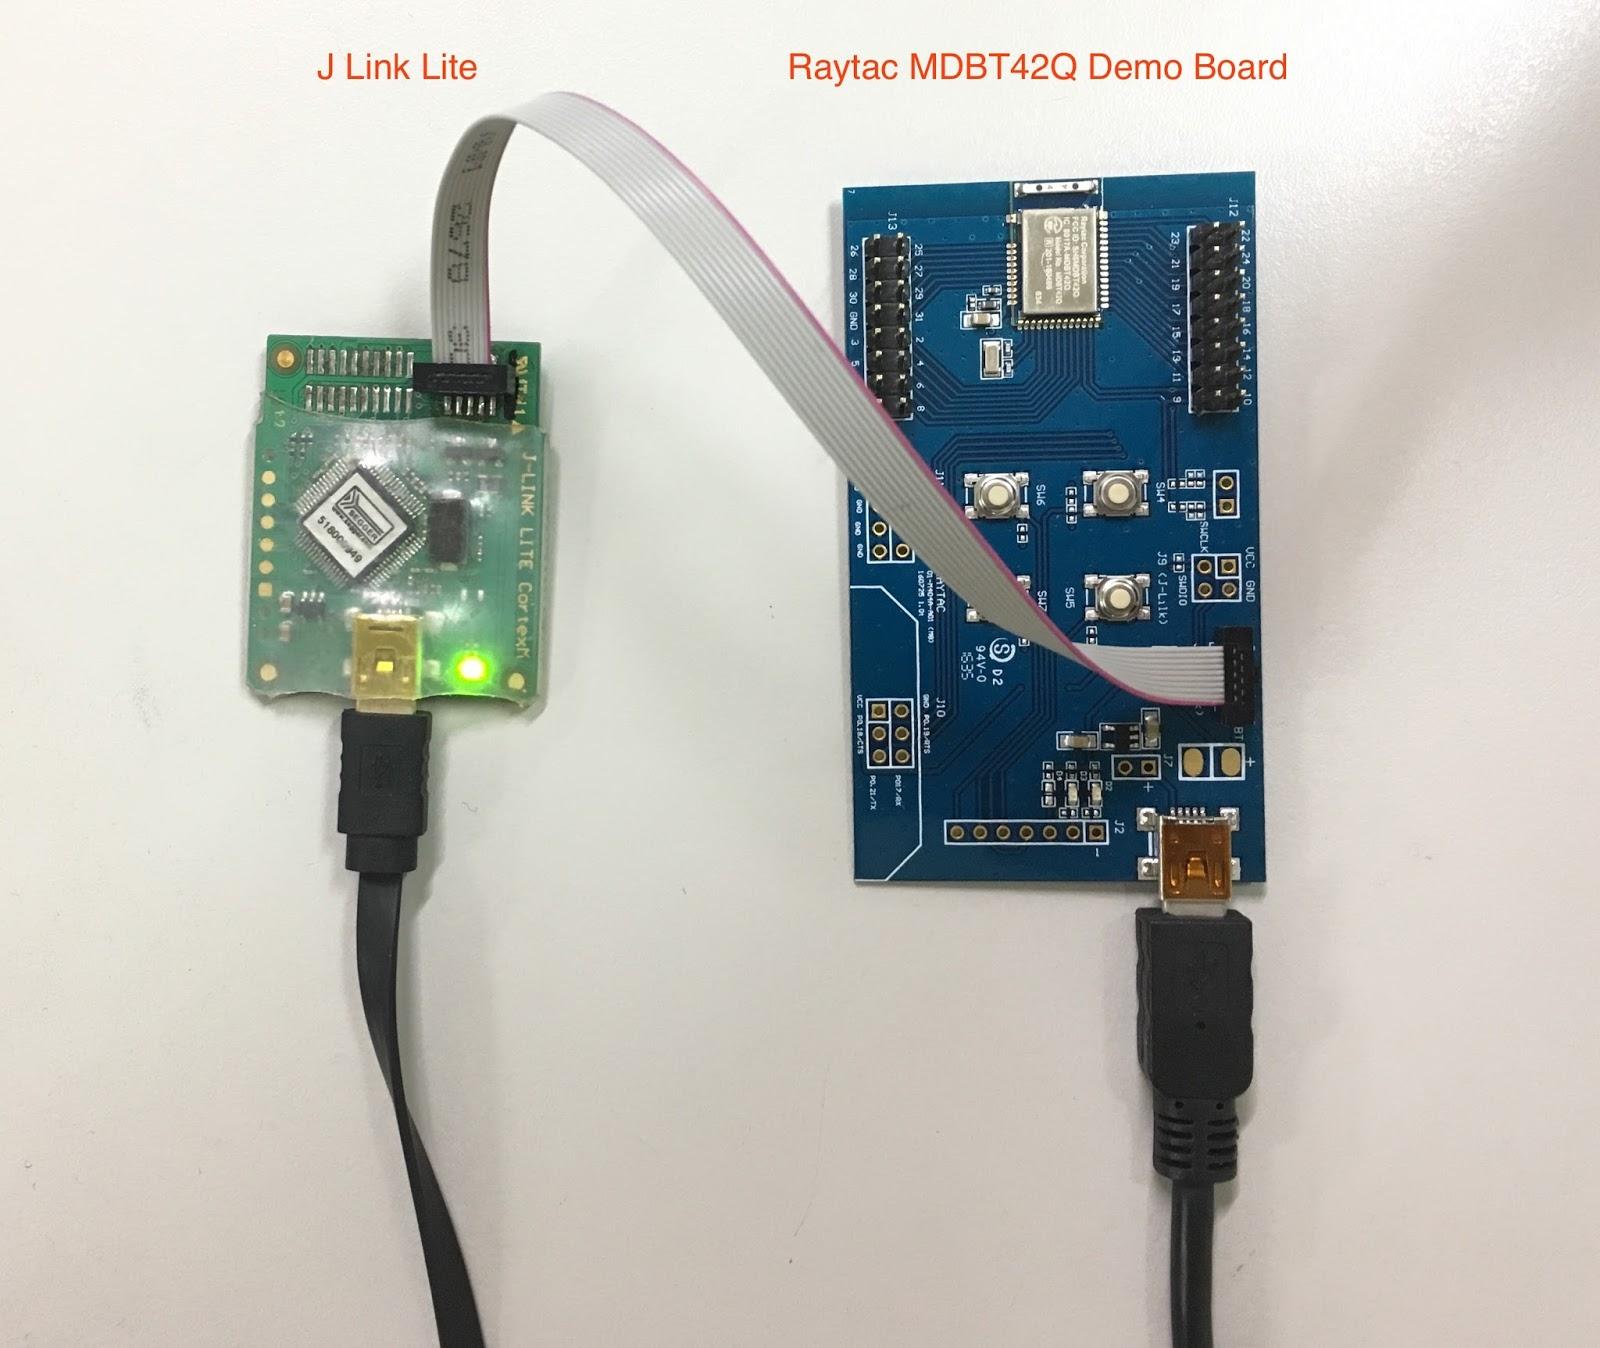 Raytac, Nordic, nRF51, nRF52, Bluetooth, BT4 0, BT4 1, BT4 2, BT5